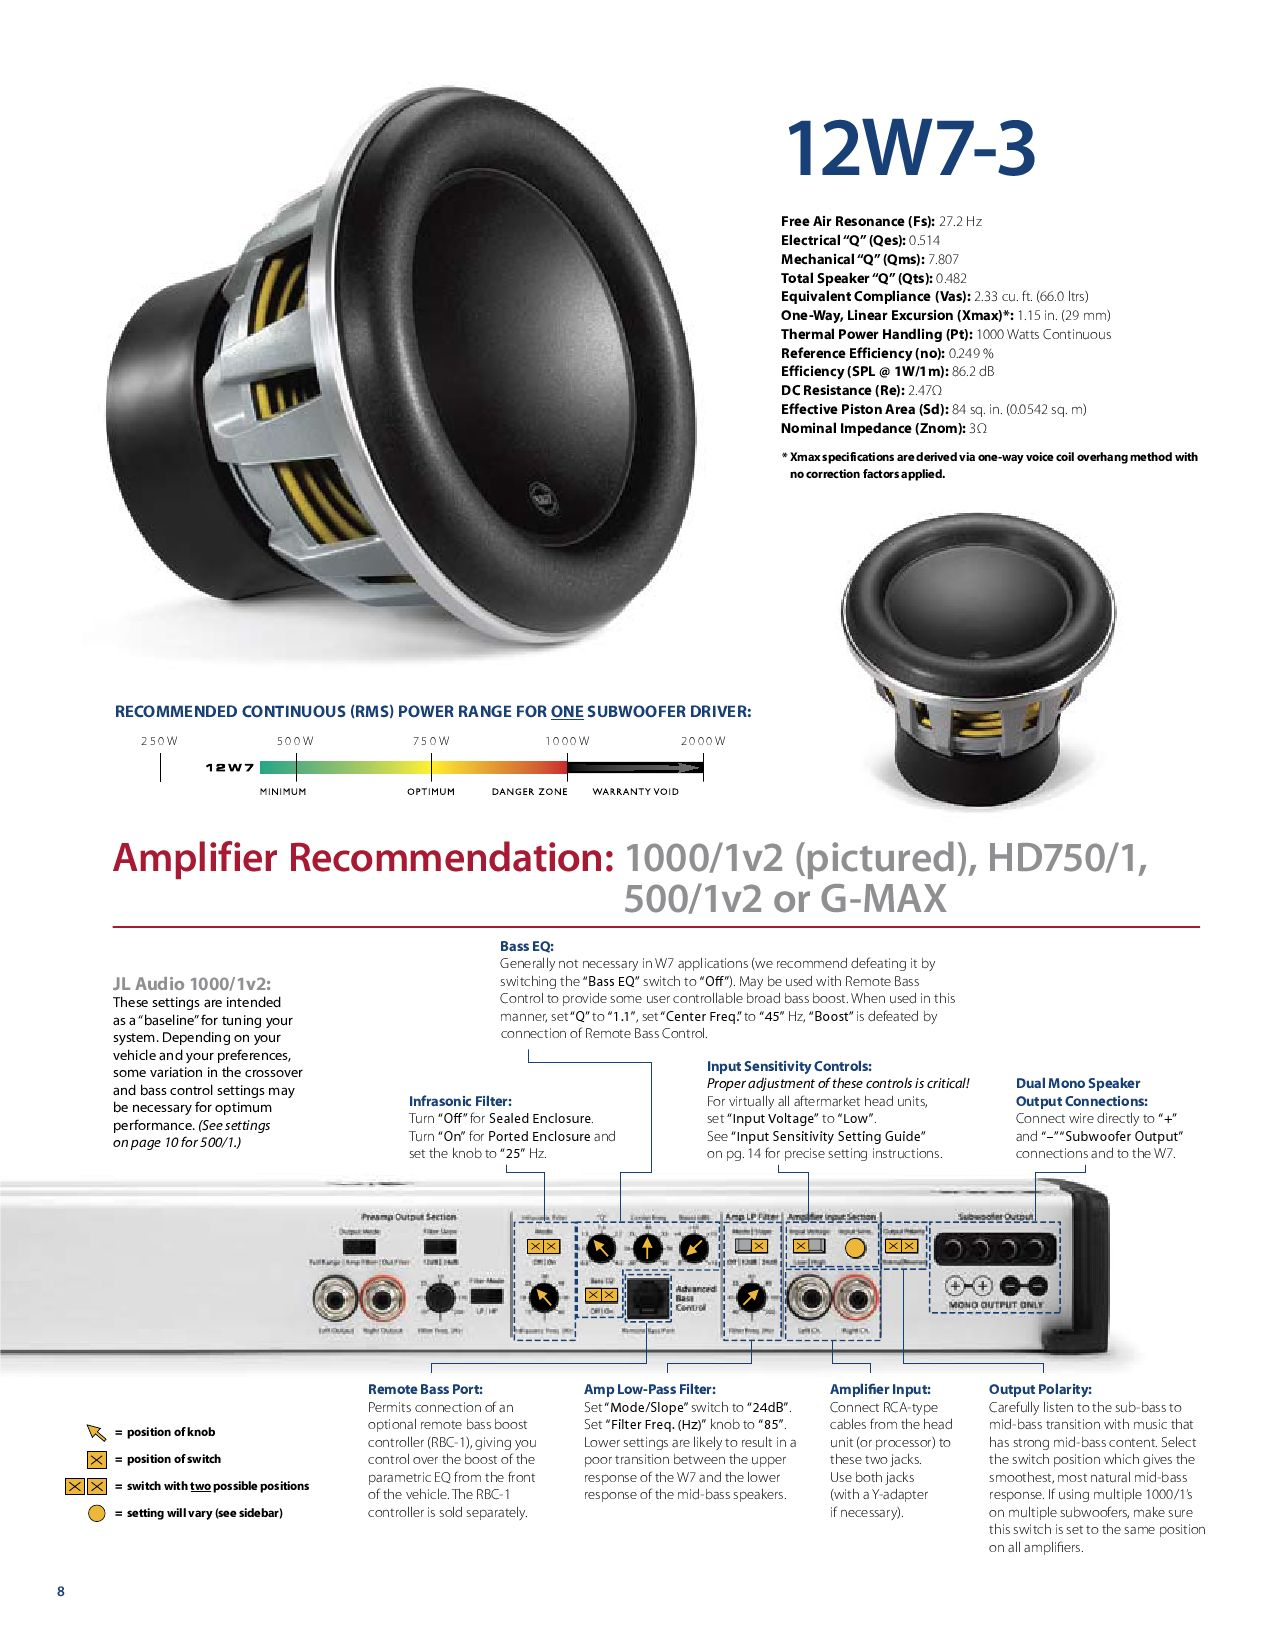 jl audio 12w7 manual by talk audio online issuu rh issuu com JL Audio 500 Watt Amp jl audio 500 1 v2 manual